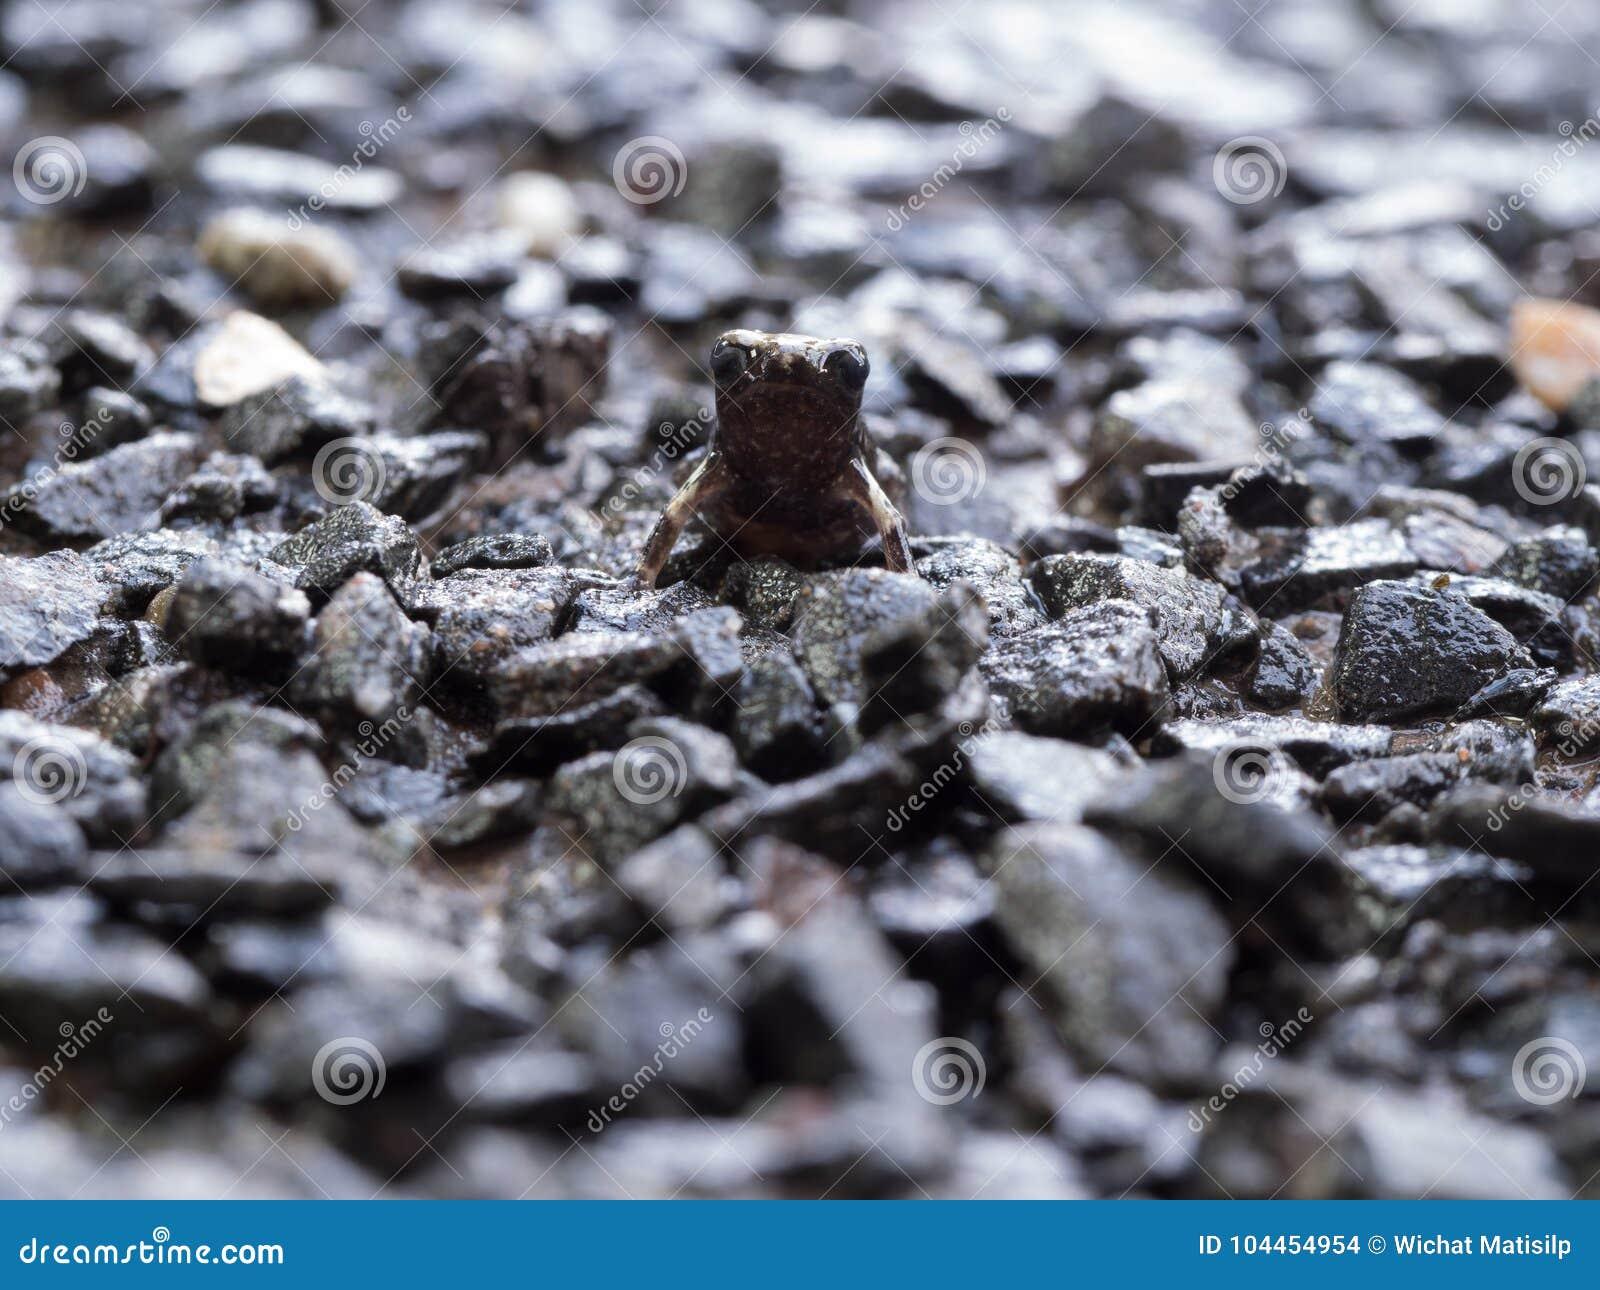 Little Bullfrog Sitting on The Stone Ground